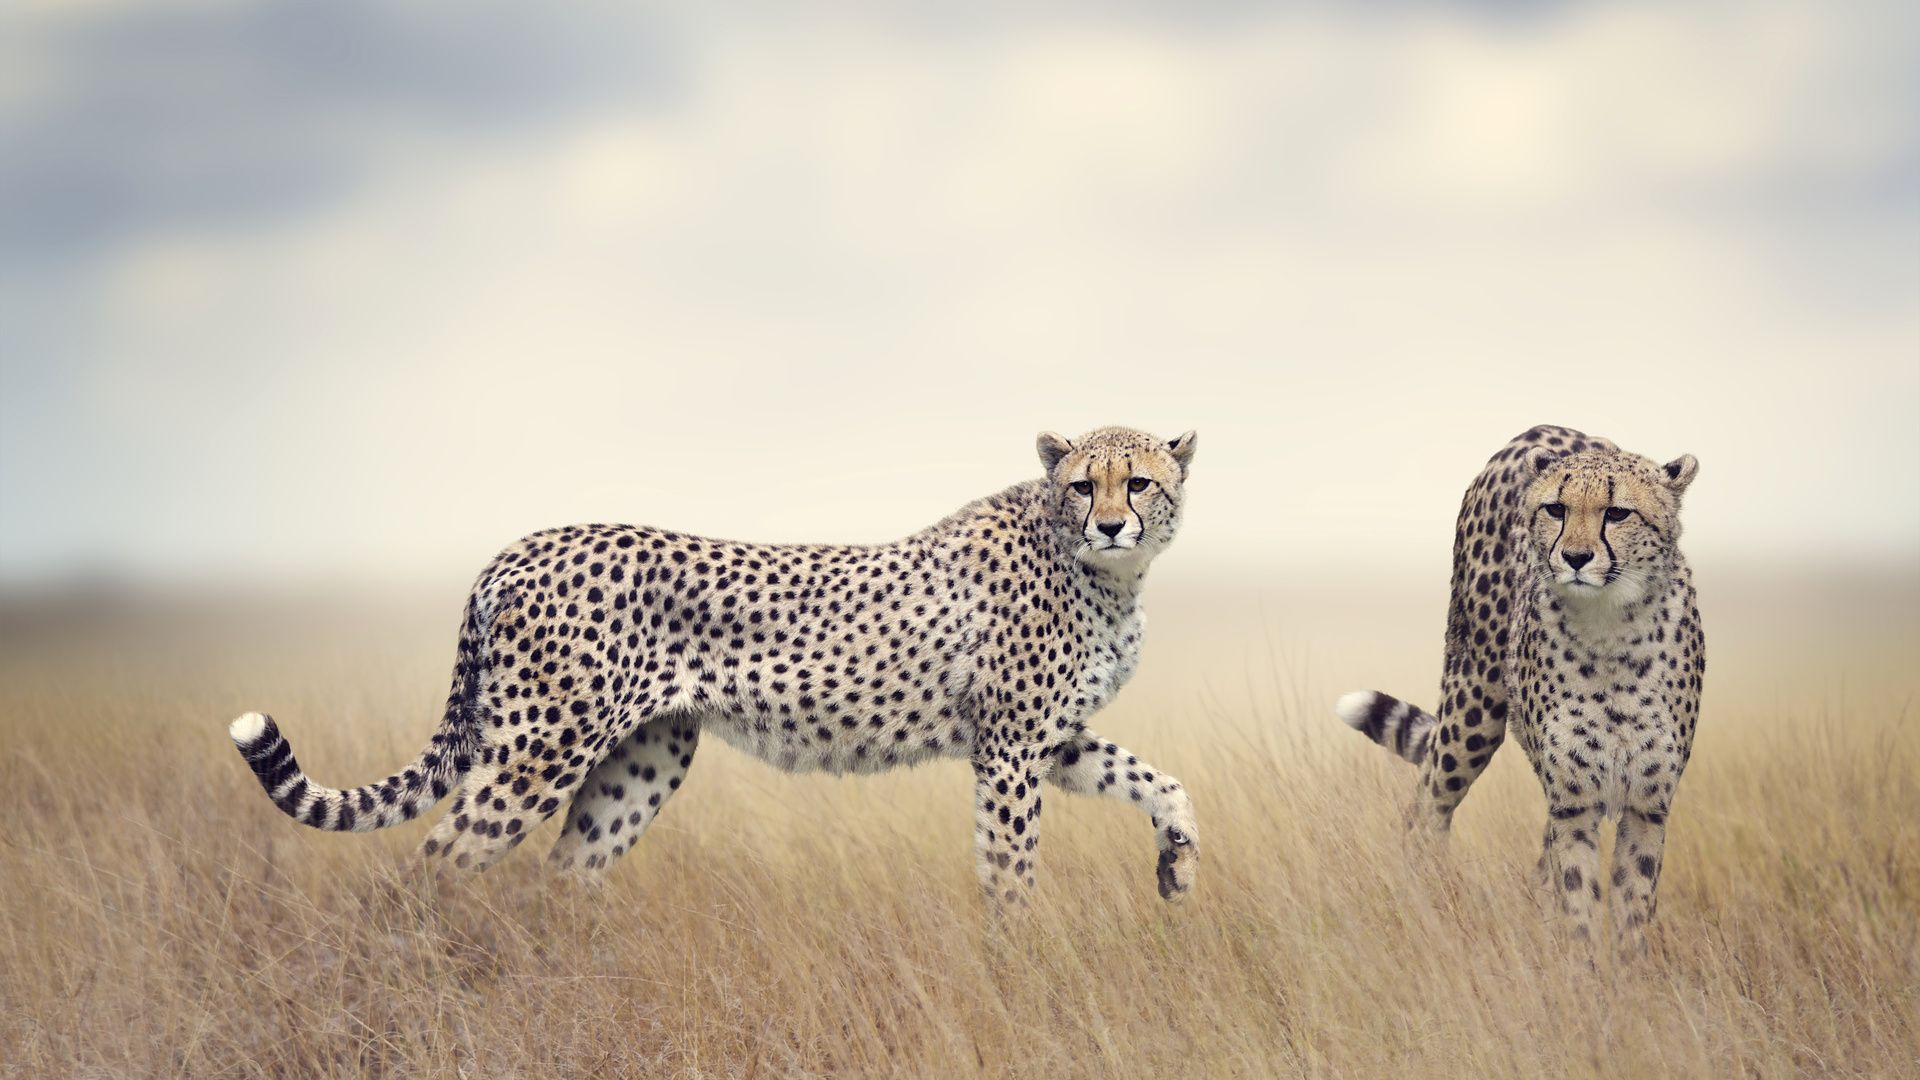 Grey Cheetah